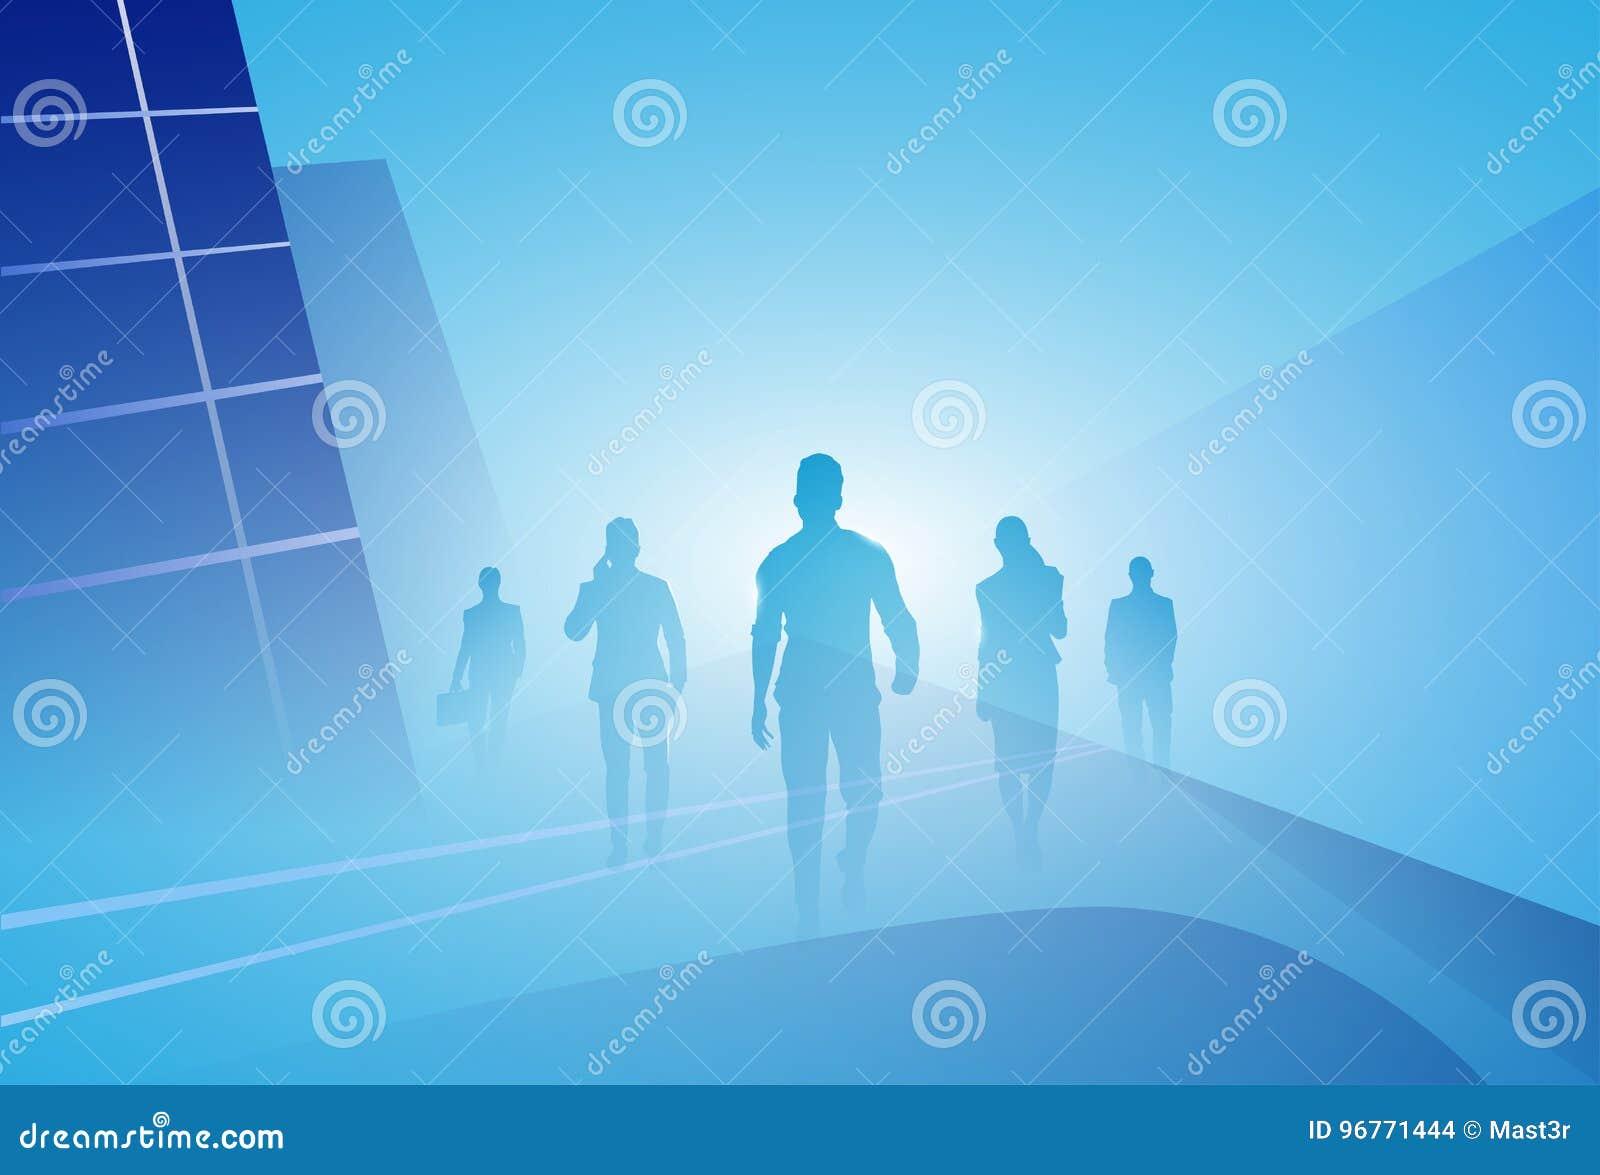 Grupo da silhueta dos empresários de executivos da etapa da caminhada para a frente sobre o fundo abstrato